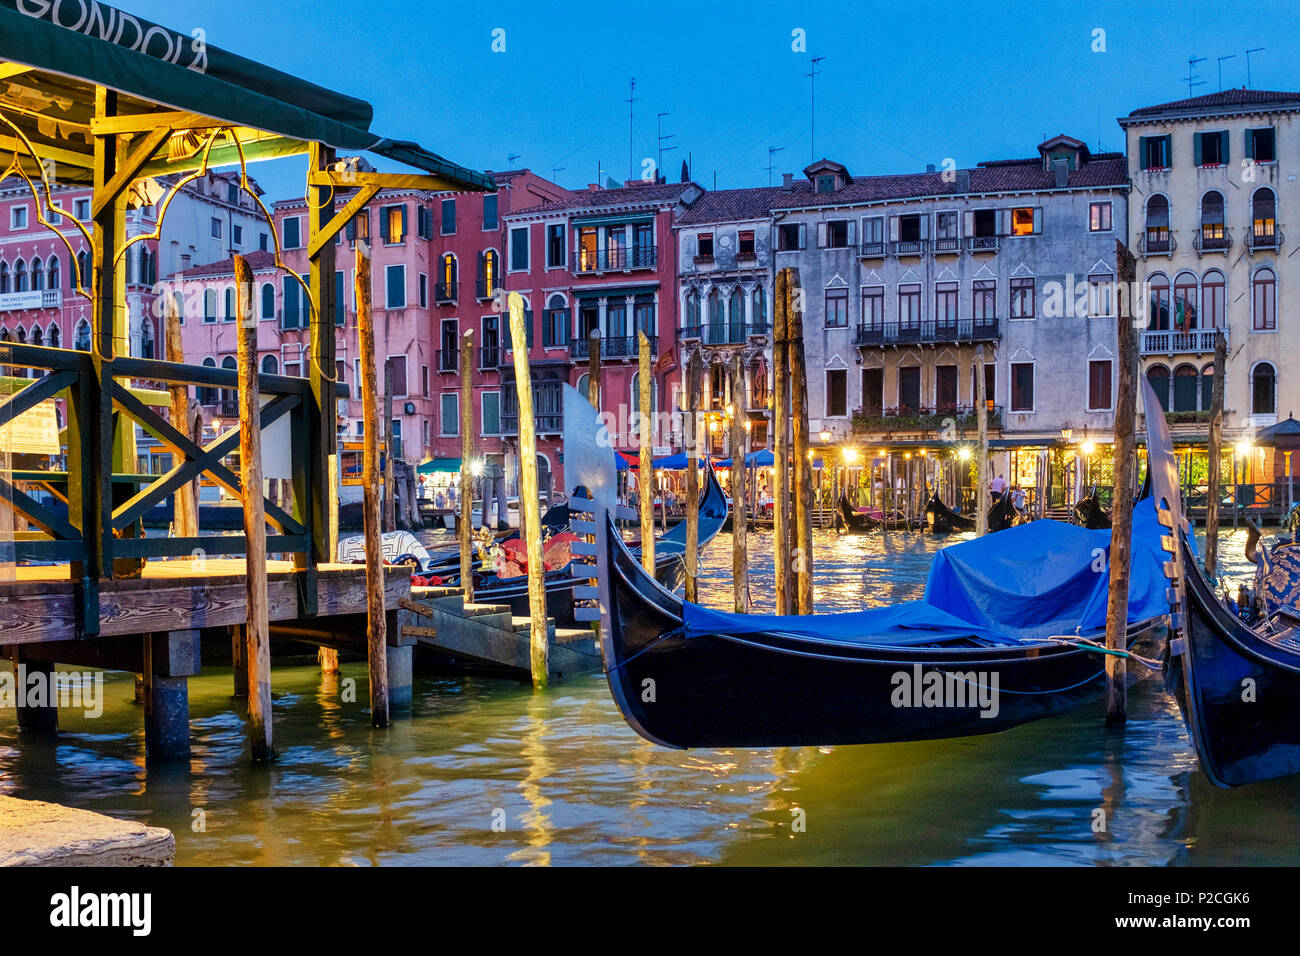 Gondolas in Canal Grande, Venice, Italy, - Stock Image